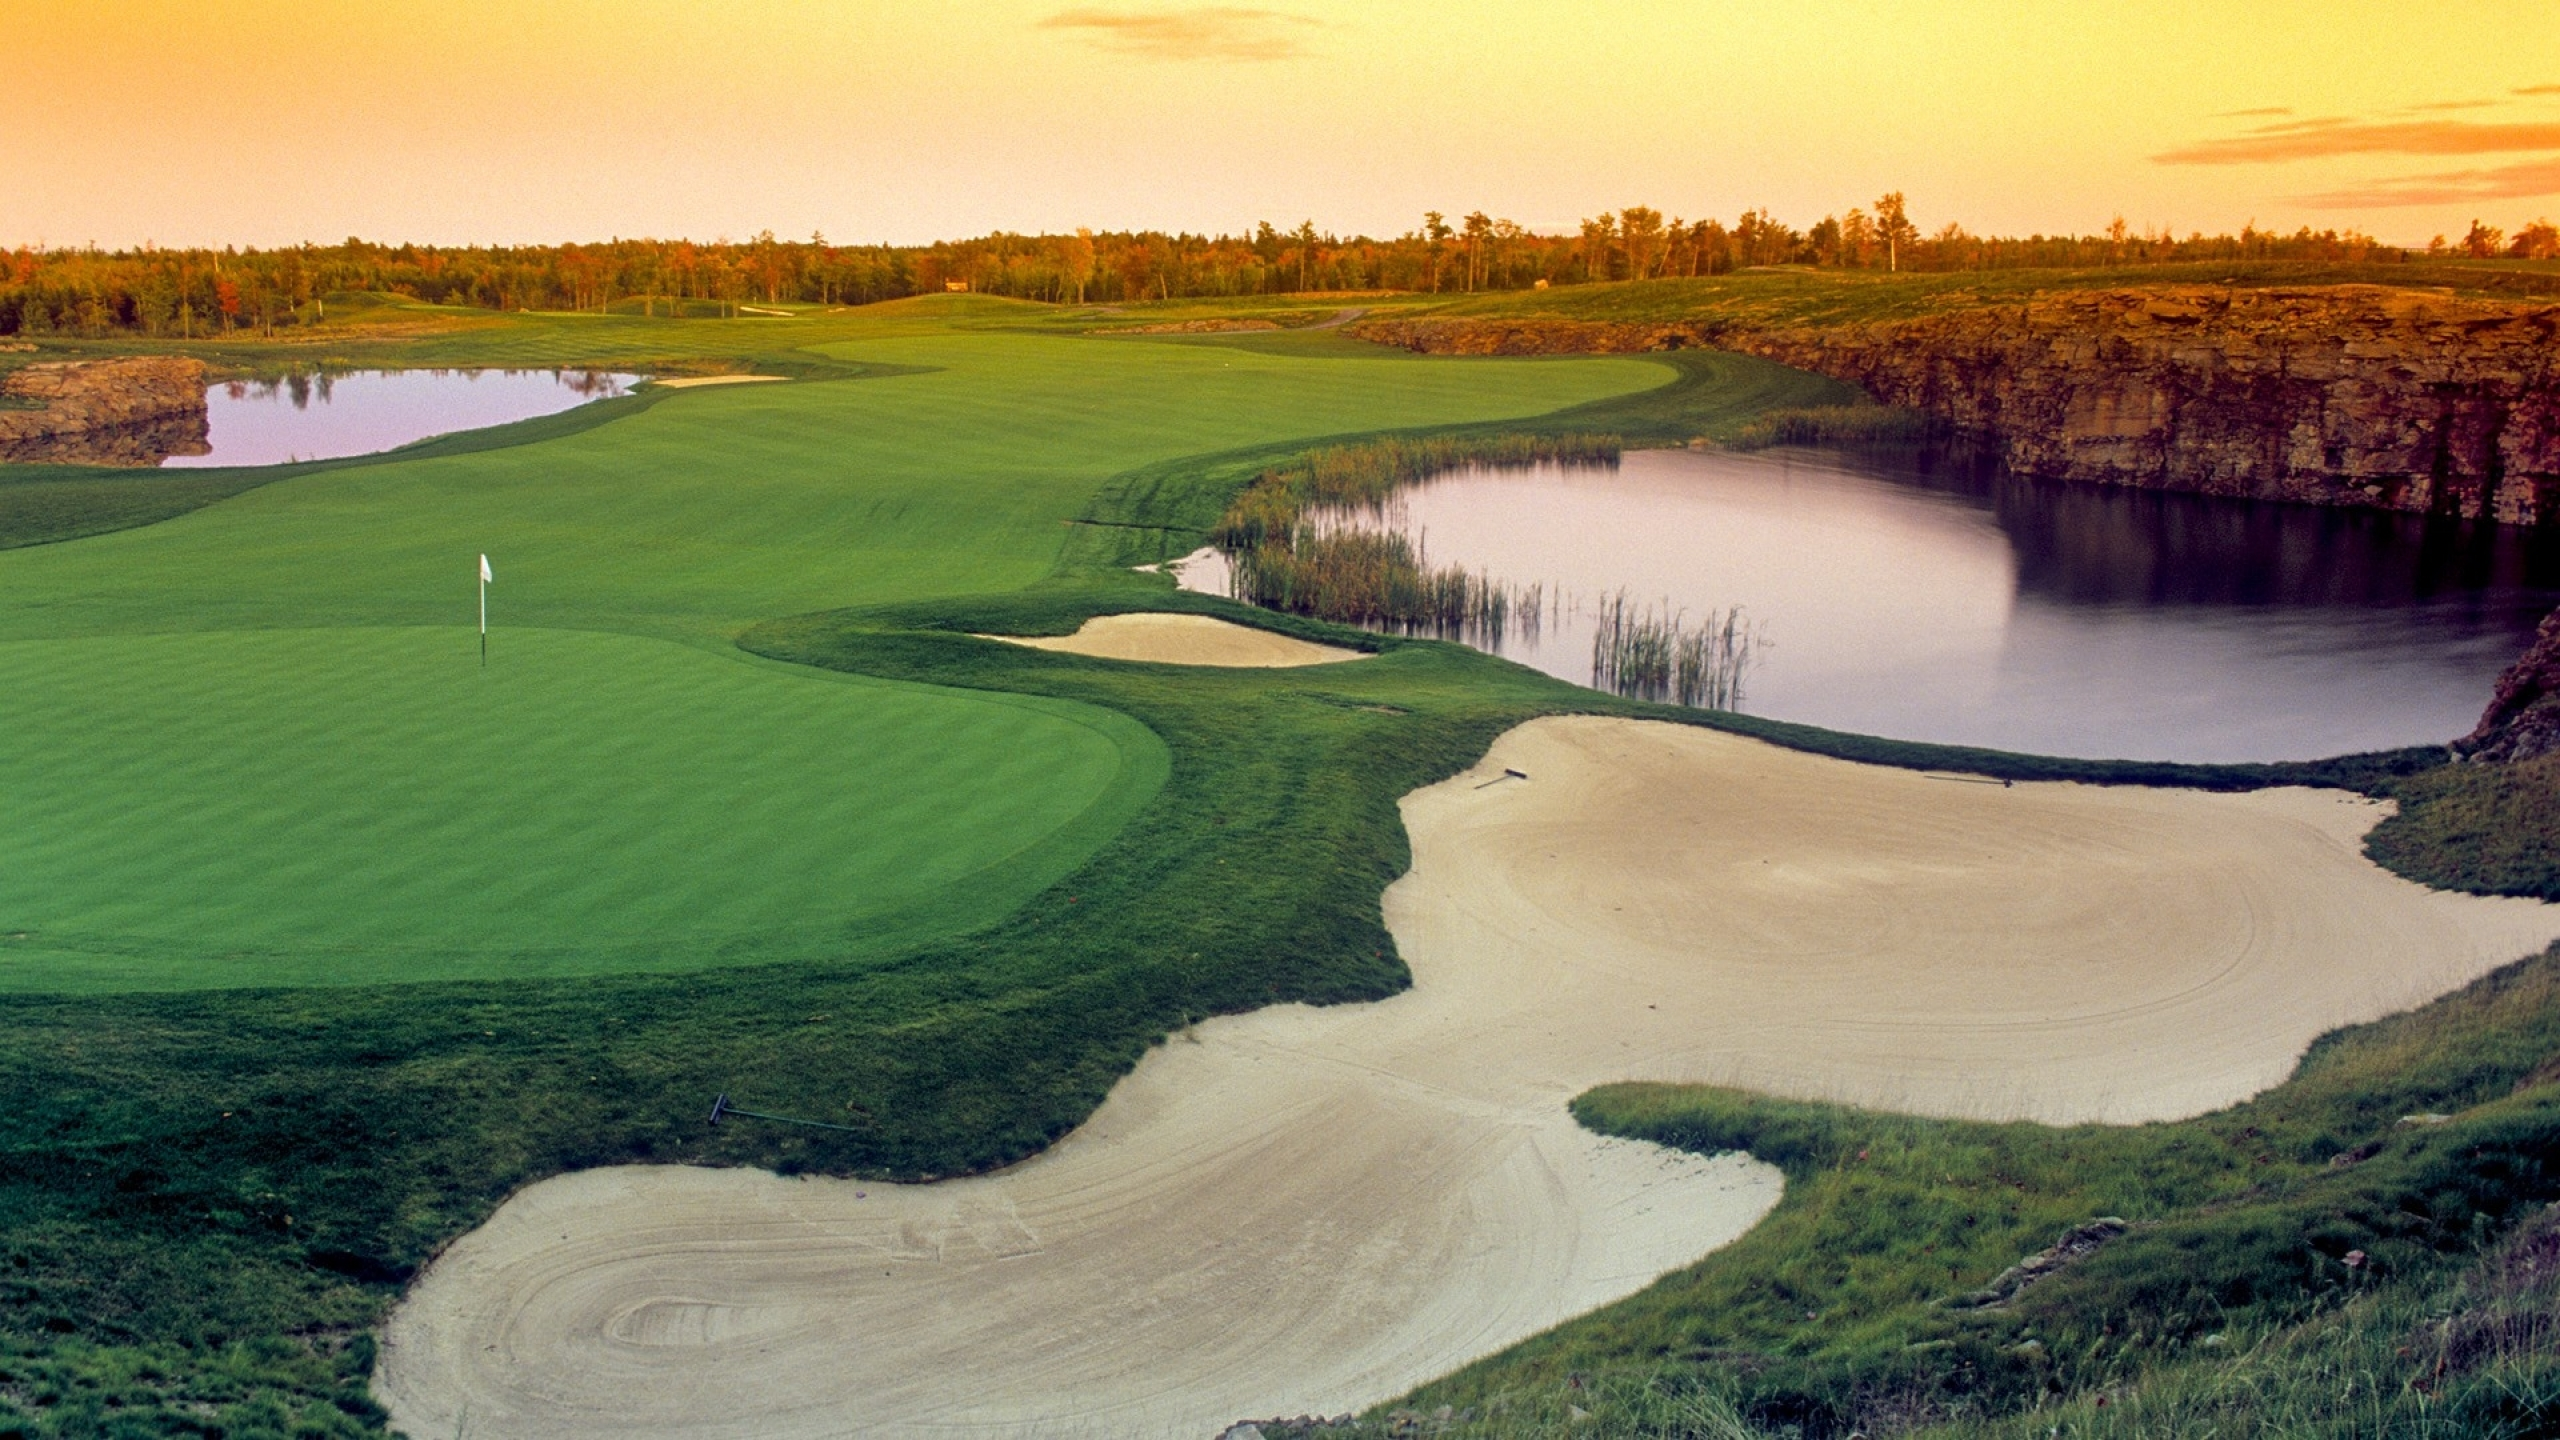 golf lakes golf course 1920x1080 wallpaper Wallpaper 2560x1440